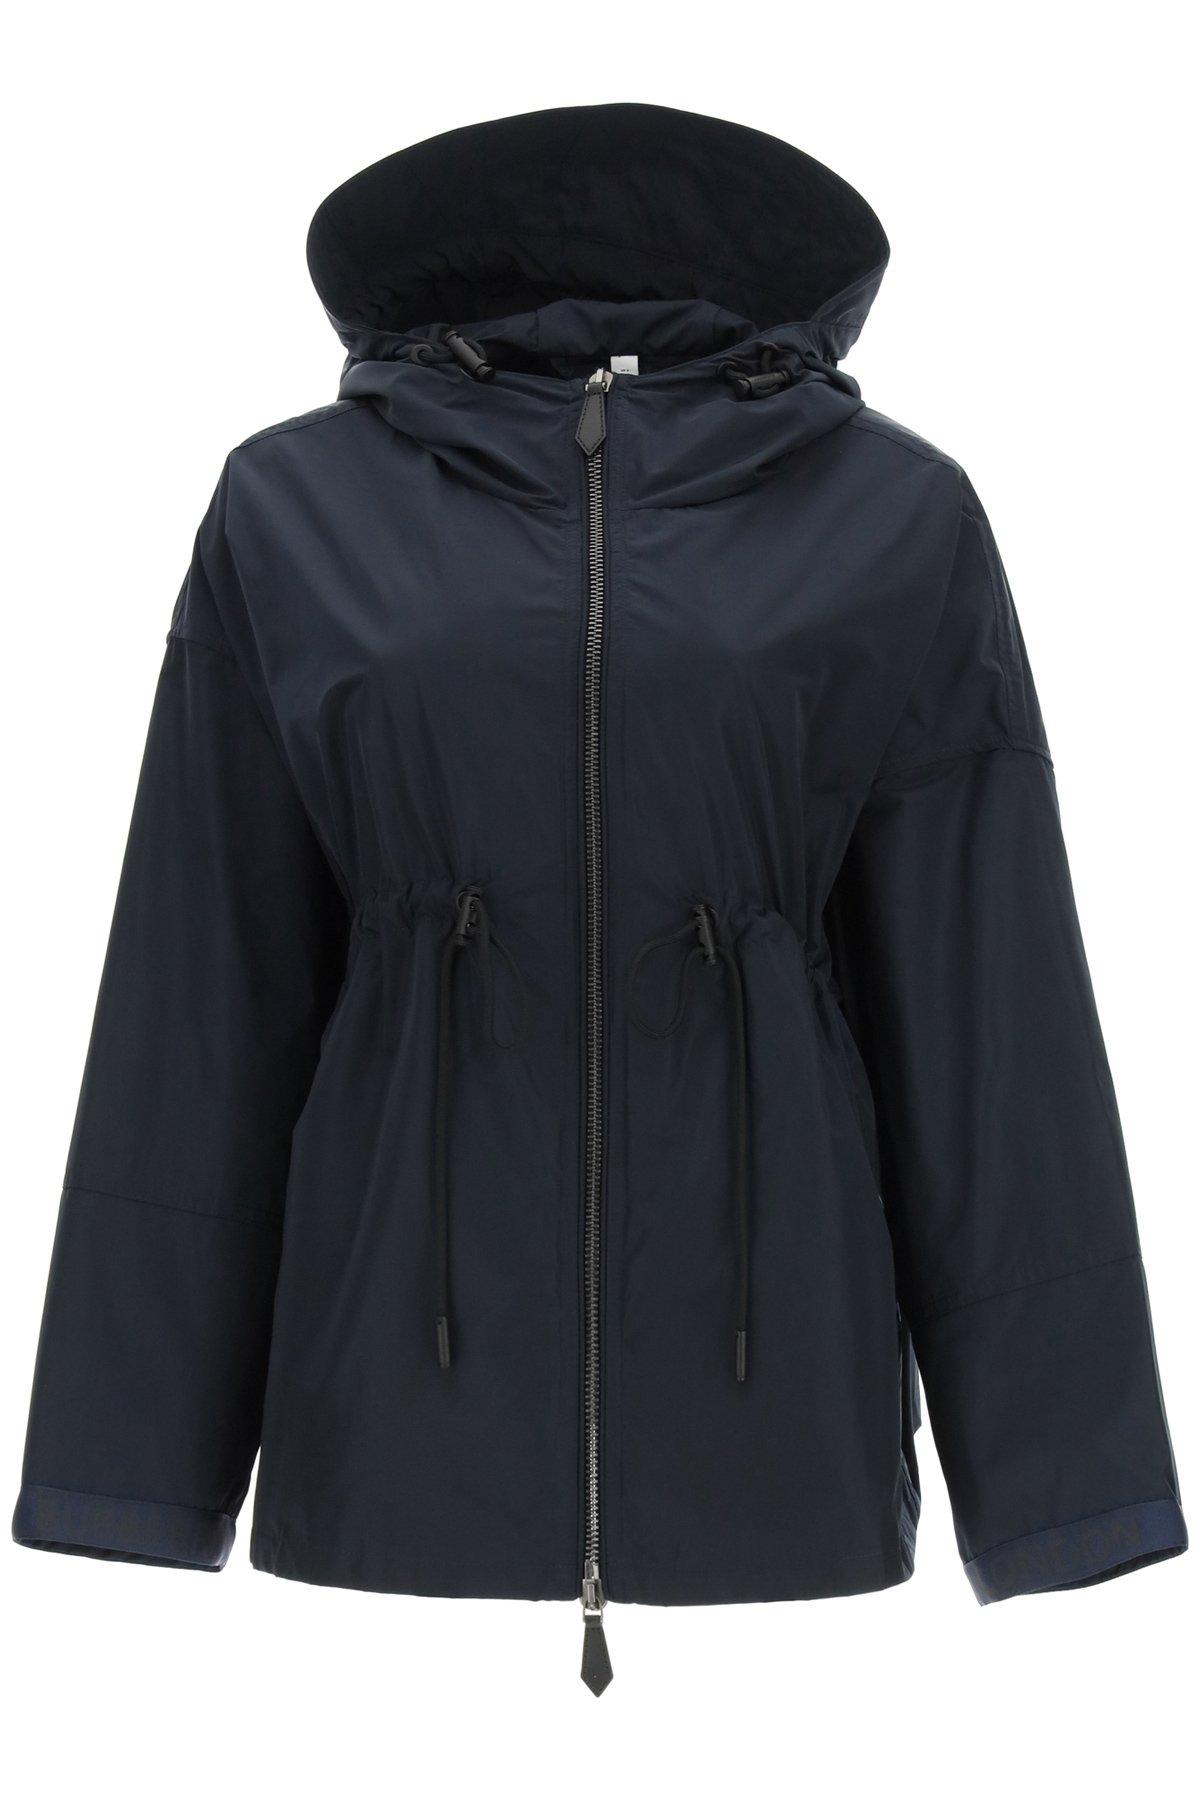 Burberry raincoat bacton in taffetà